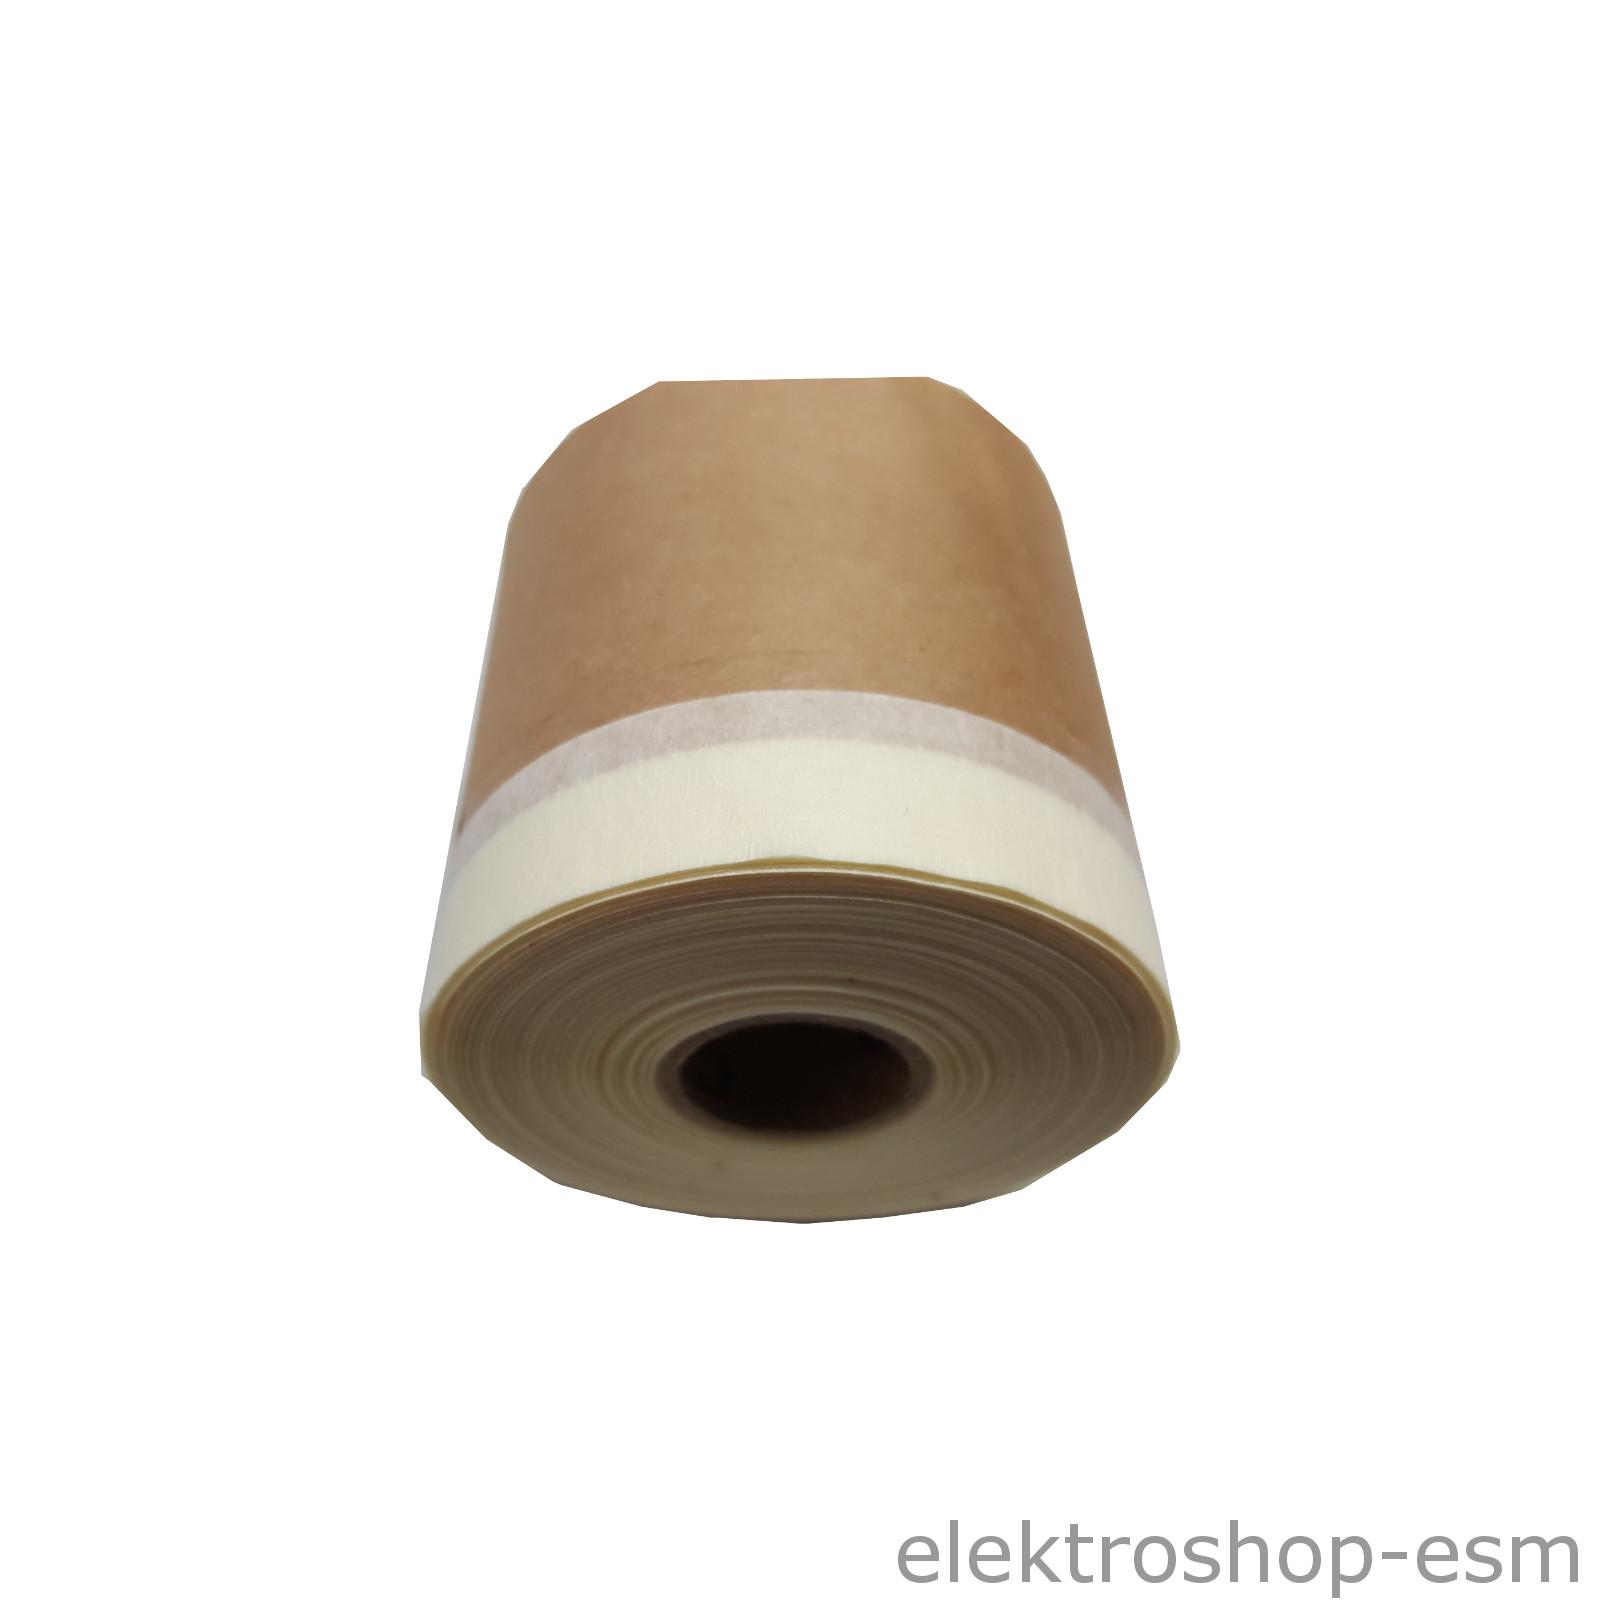 0,09€//m 1 Rolle Abdeckpapier 180mm x 20m Abklebepapier Masker Papier Kreppband